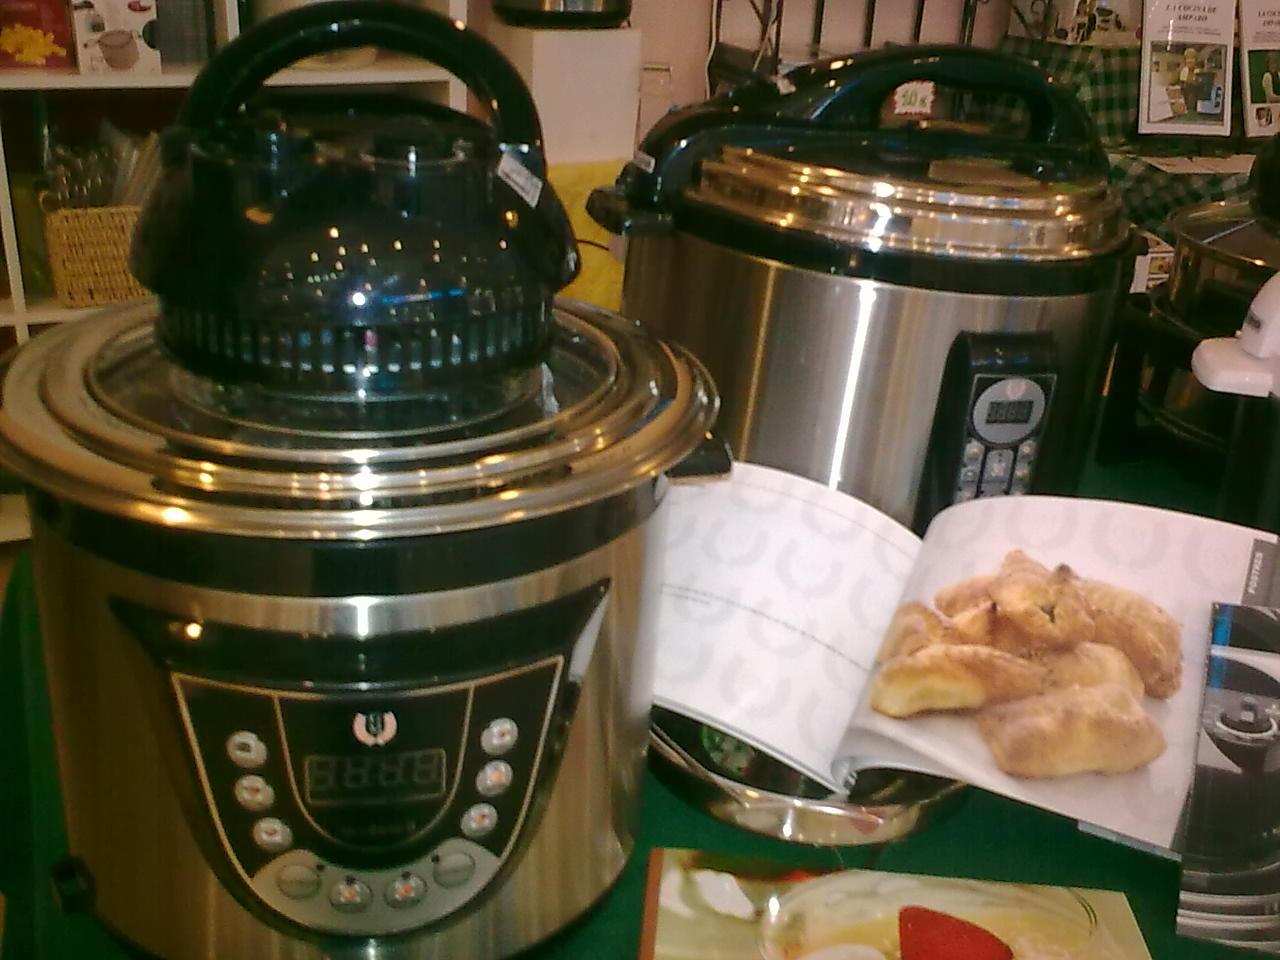 Ollas gm cocinan hoy como limpiar el cabezal de horno de - Limpiar horno con limon ...